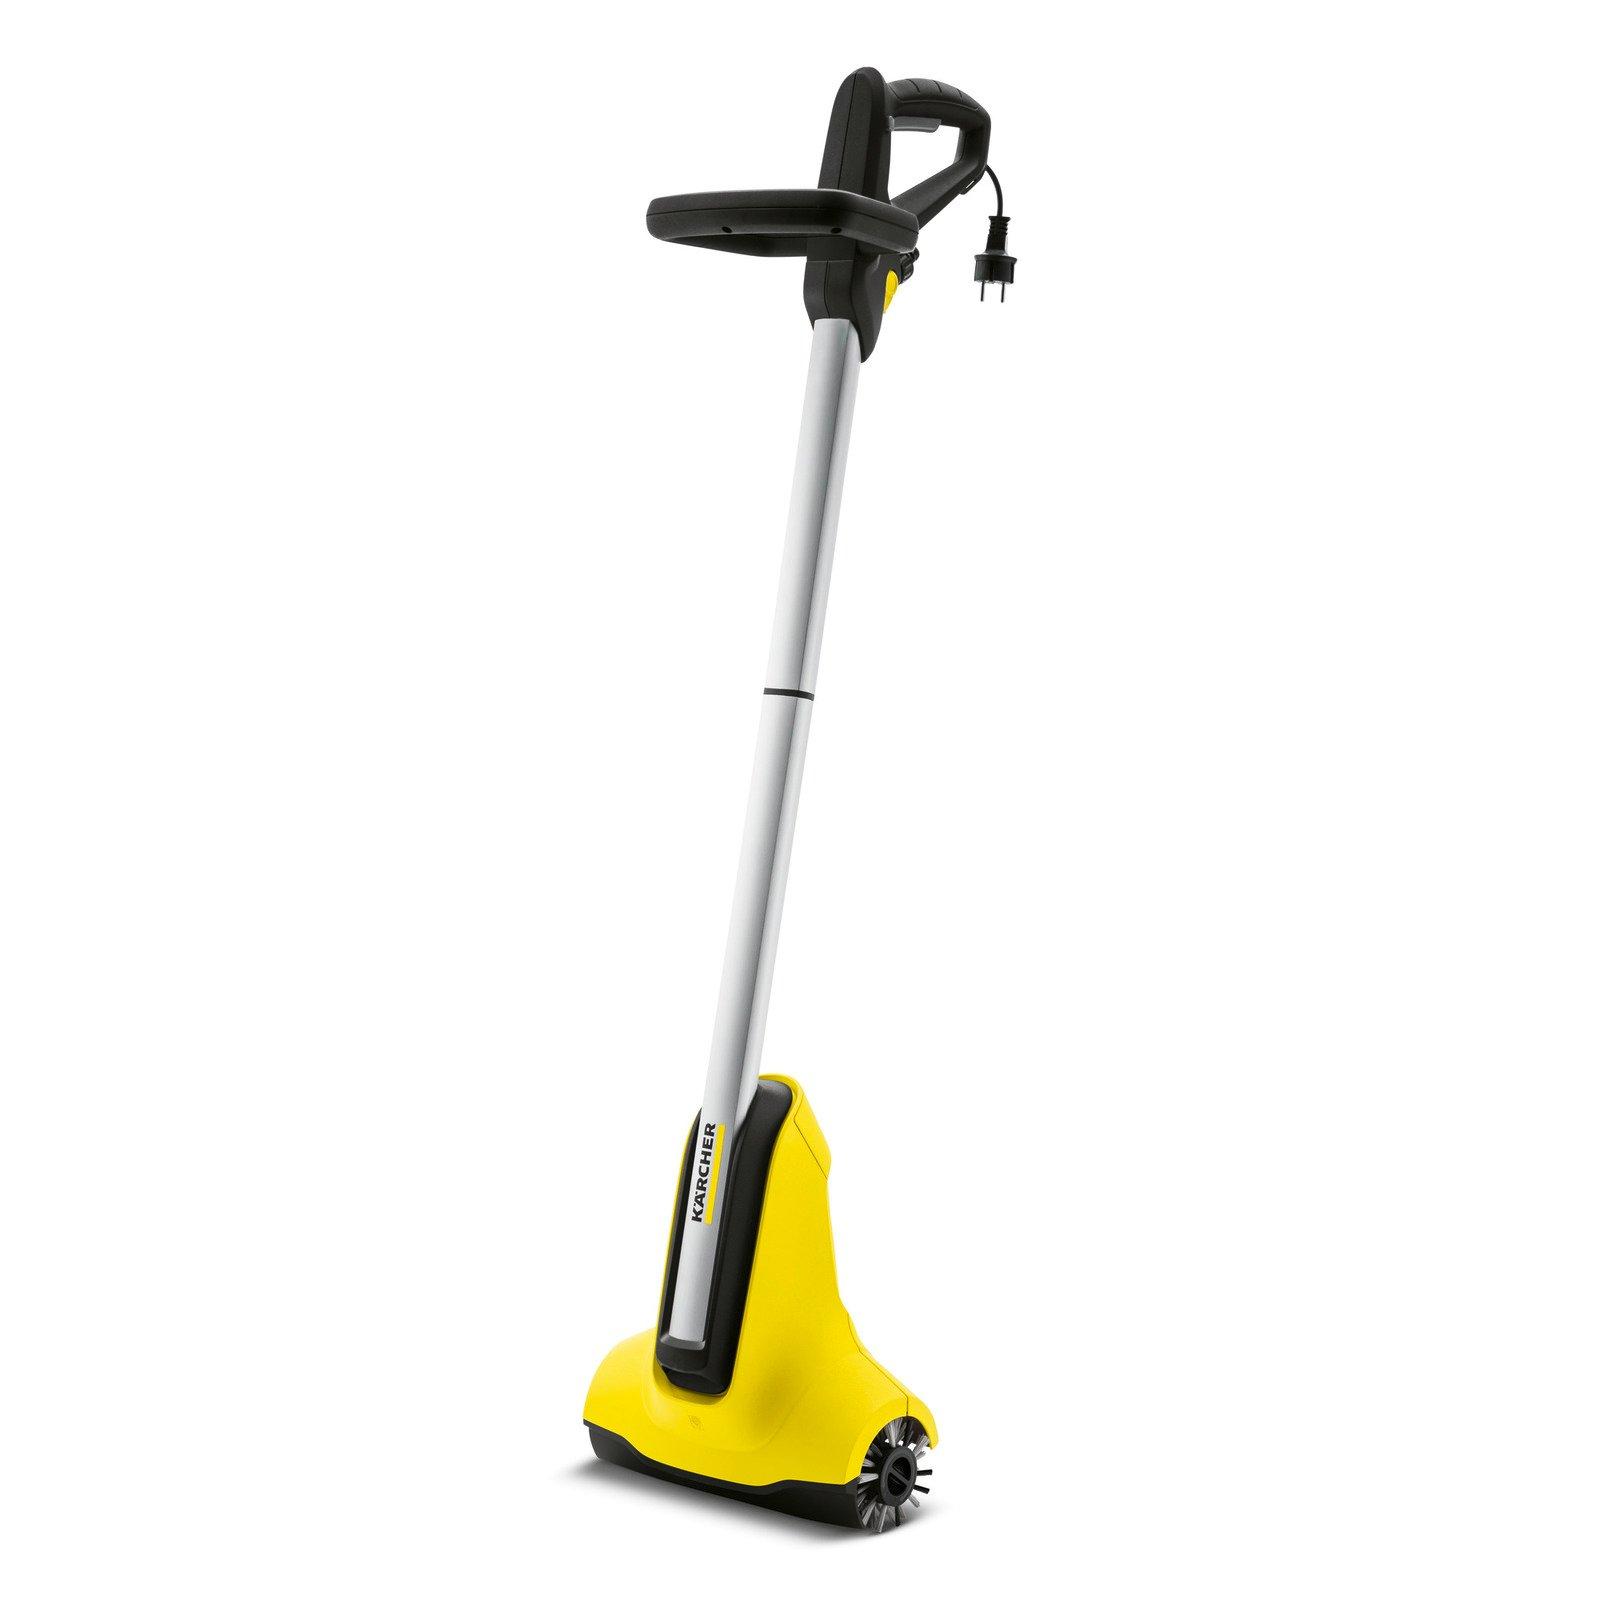 Kärcher - PCL 4 Patio Cleaner